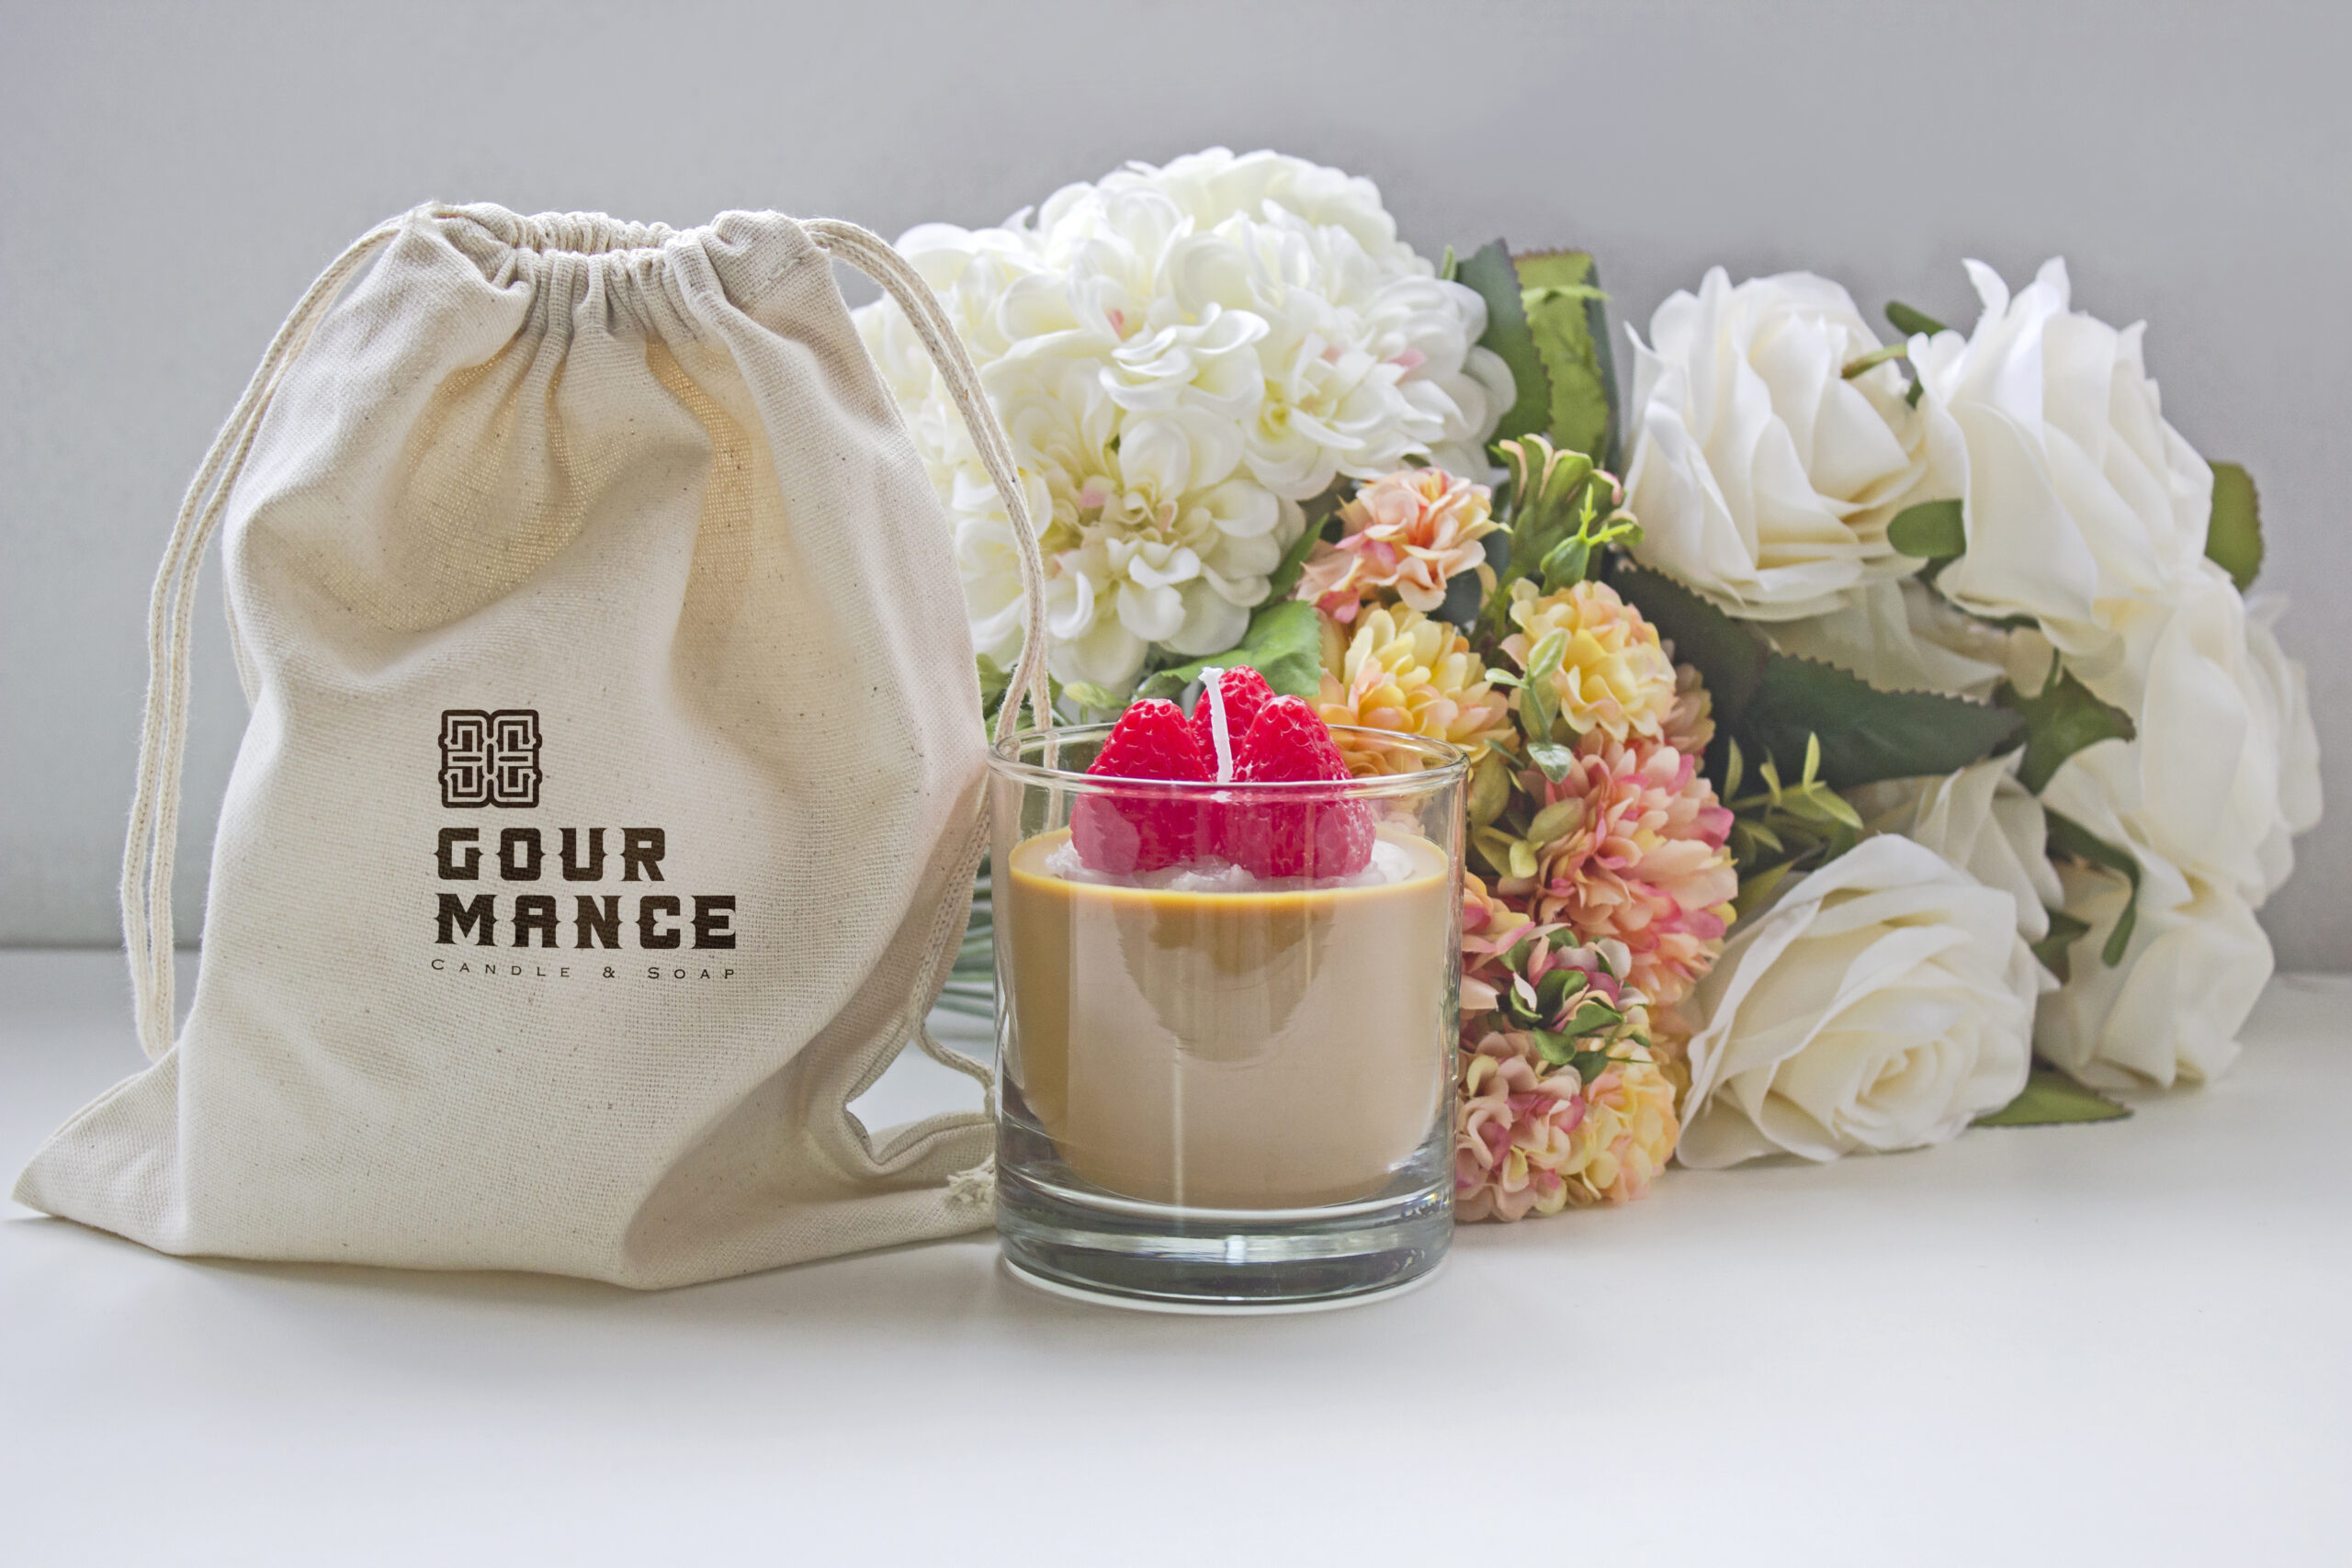 bolsa lienzo serigrafiada con logo gourmance y vela chocolate cafe